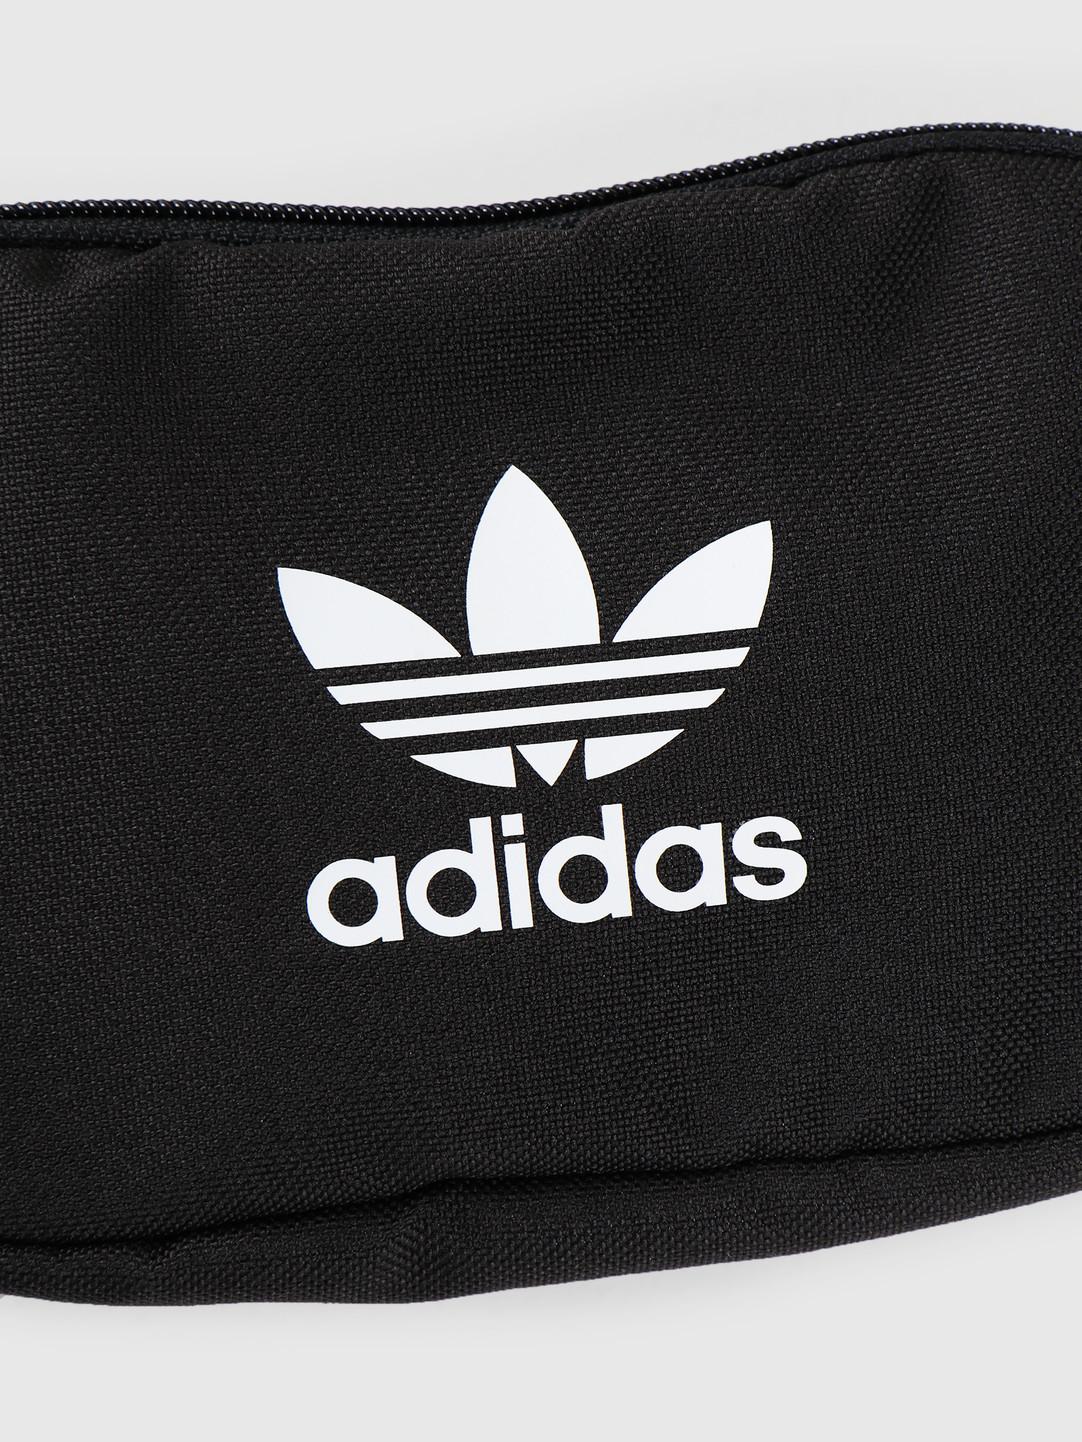 adidas adidas Essential Cbody Black DV2400